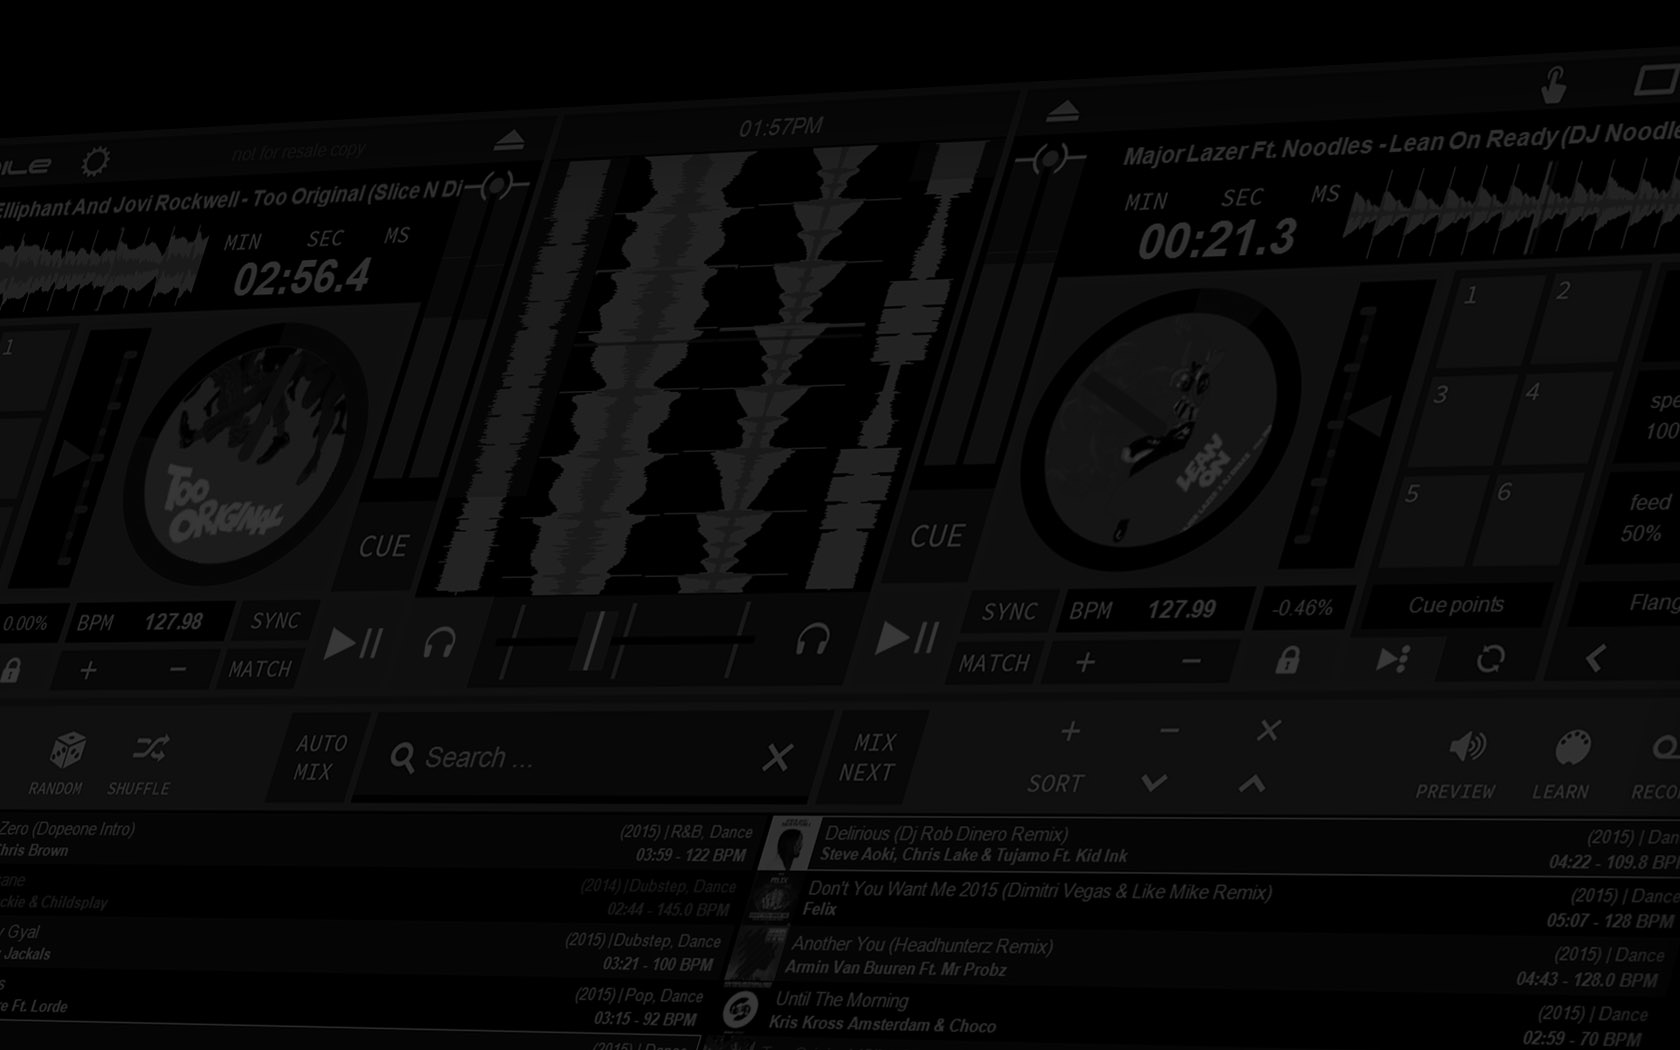 RED Mobile 3 DJ software background image